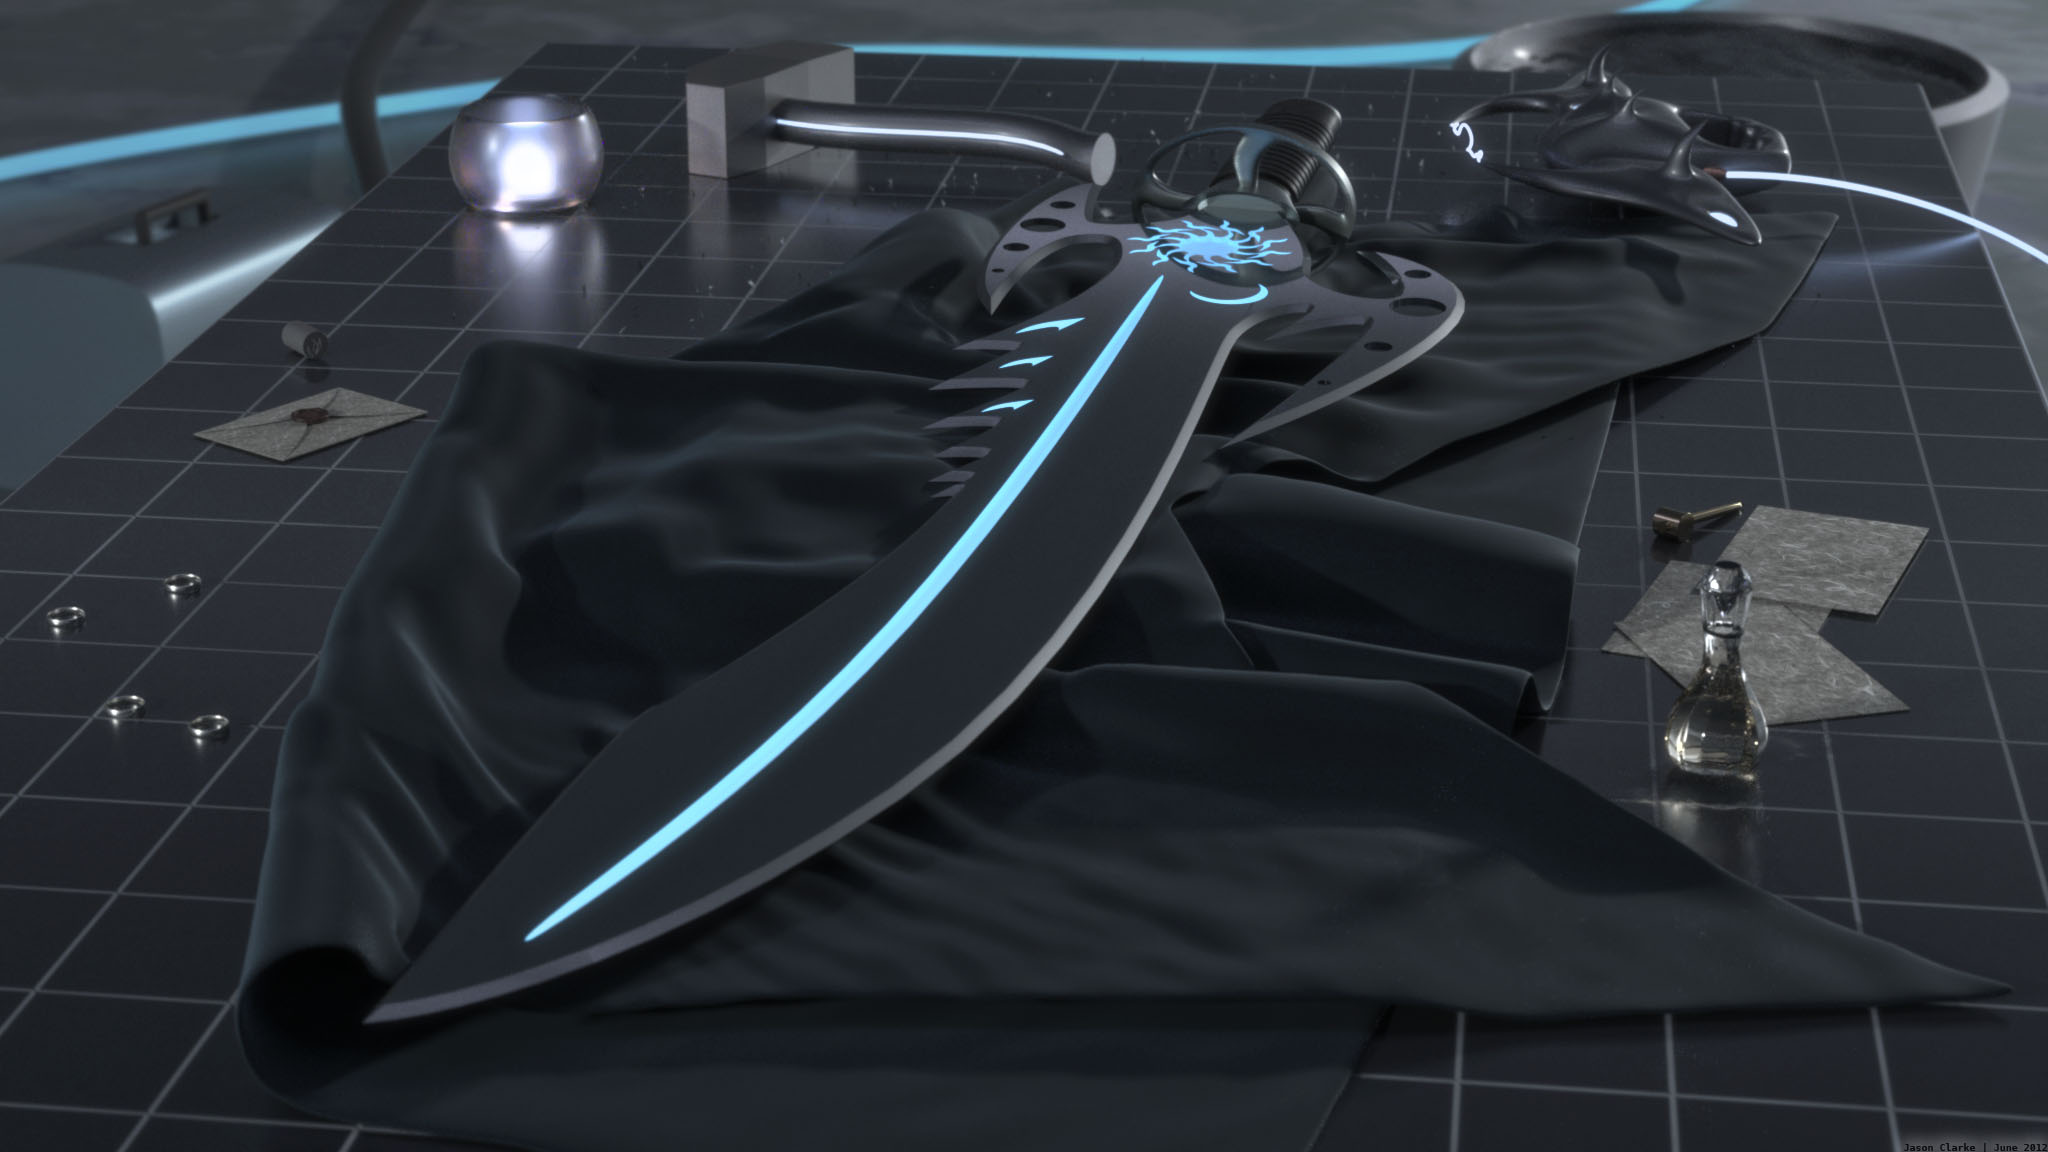 Http//j The Ninjadeviantartcom/art/Forge 306604099 Full